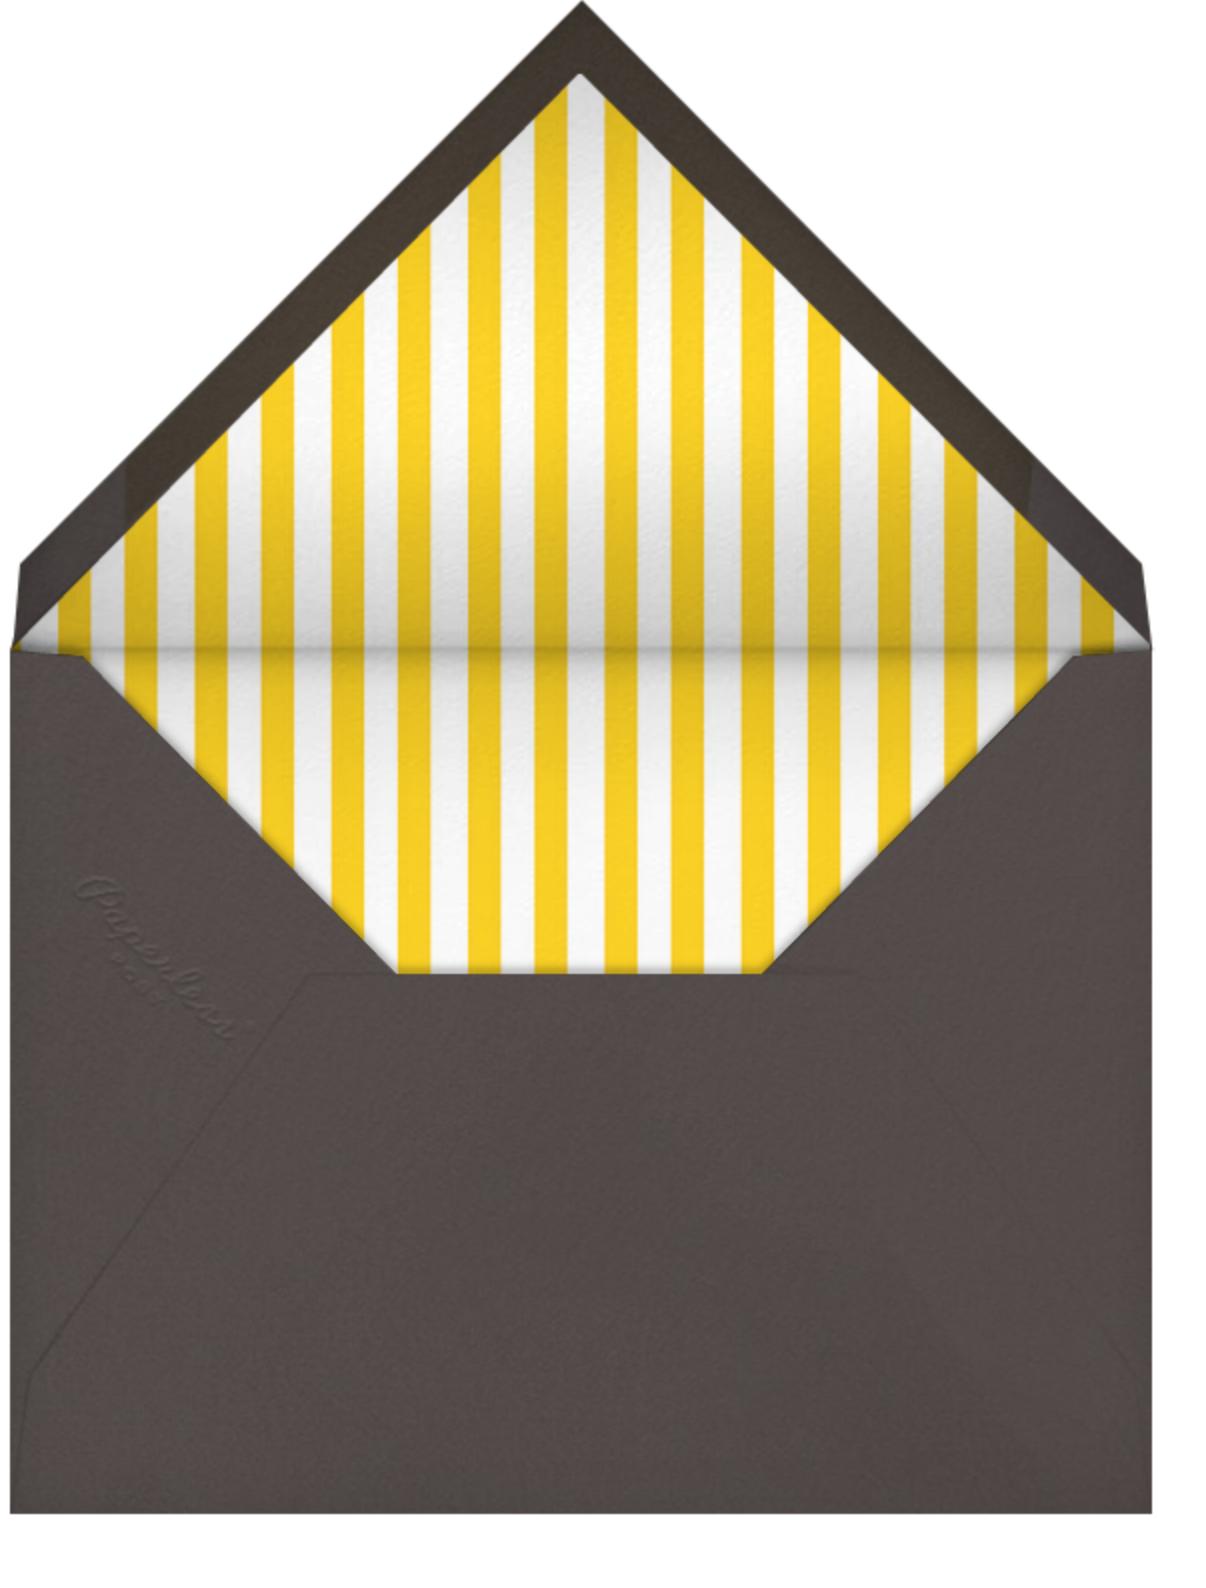 Nixon - Clay - Jonathan Adler - Cocktail party - envelope back